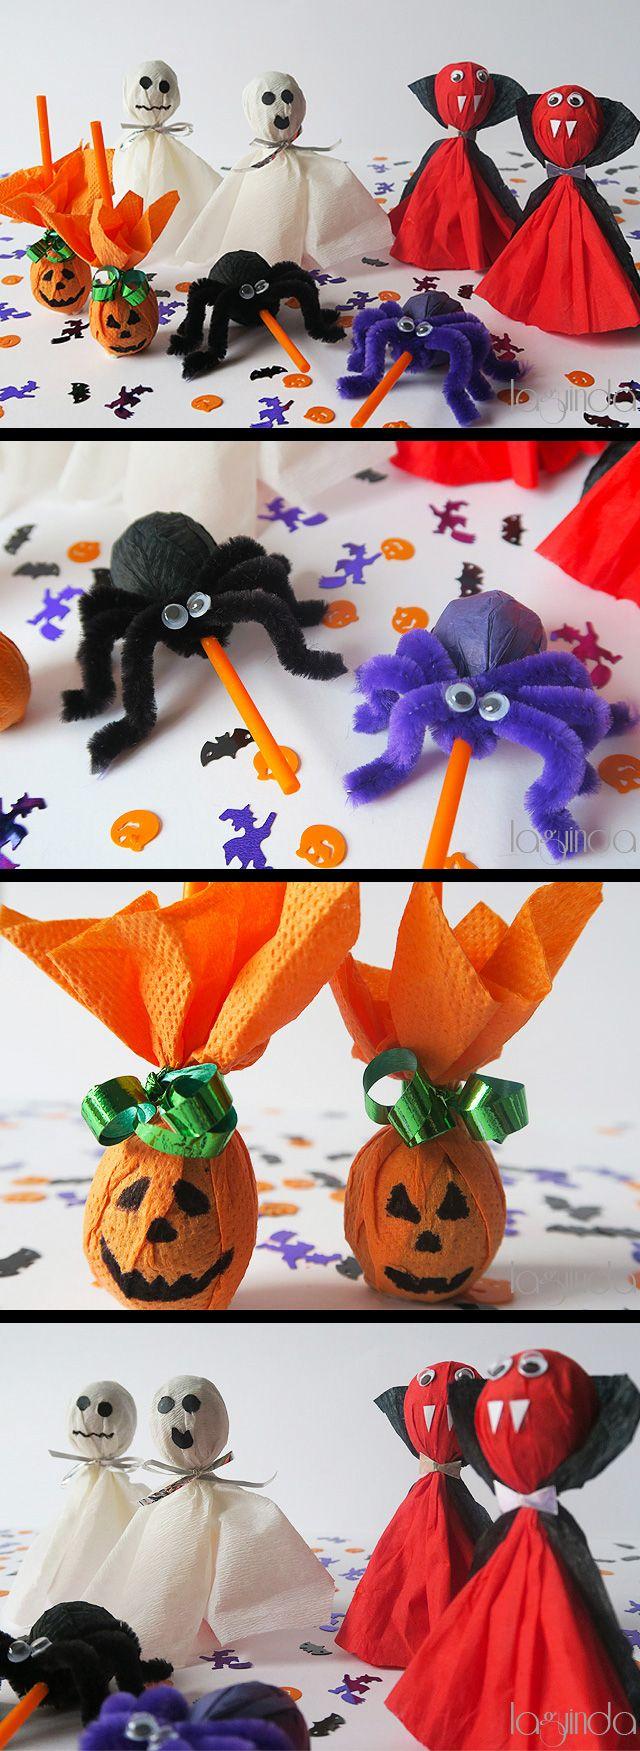 Very funny way to make halloween lollipops. Idea divertidísima para decorar chupa-chups en Halloween.